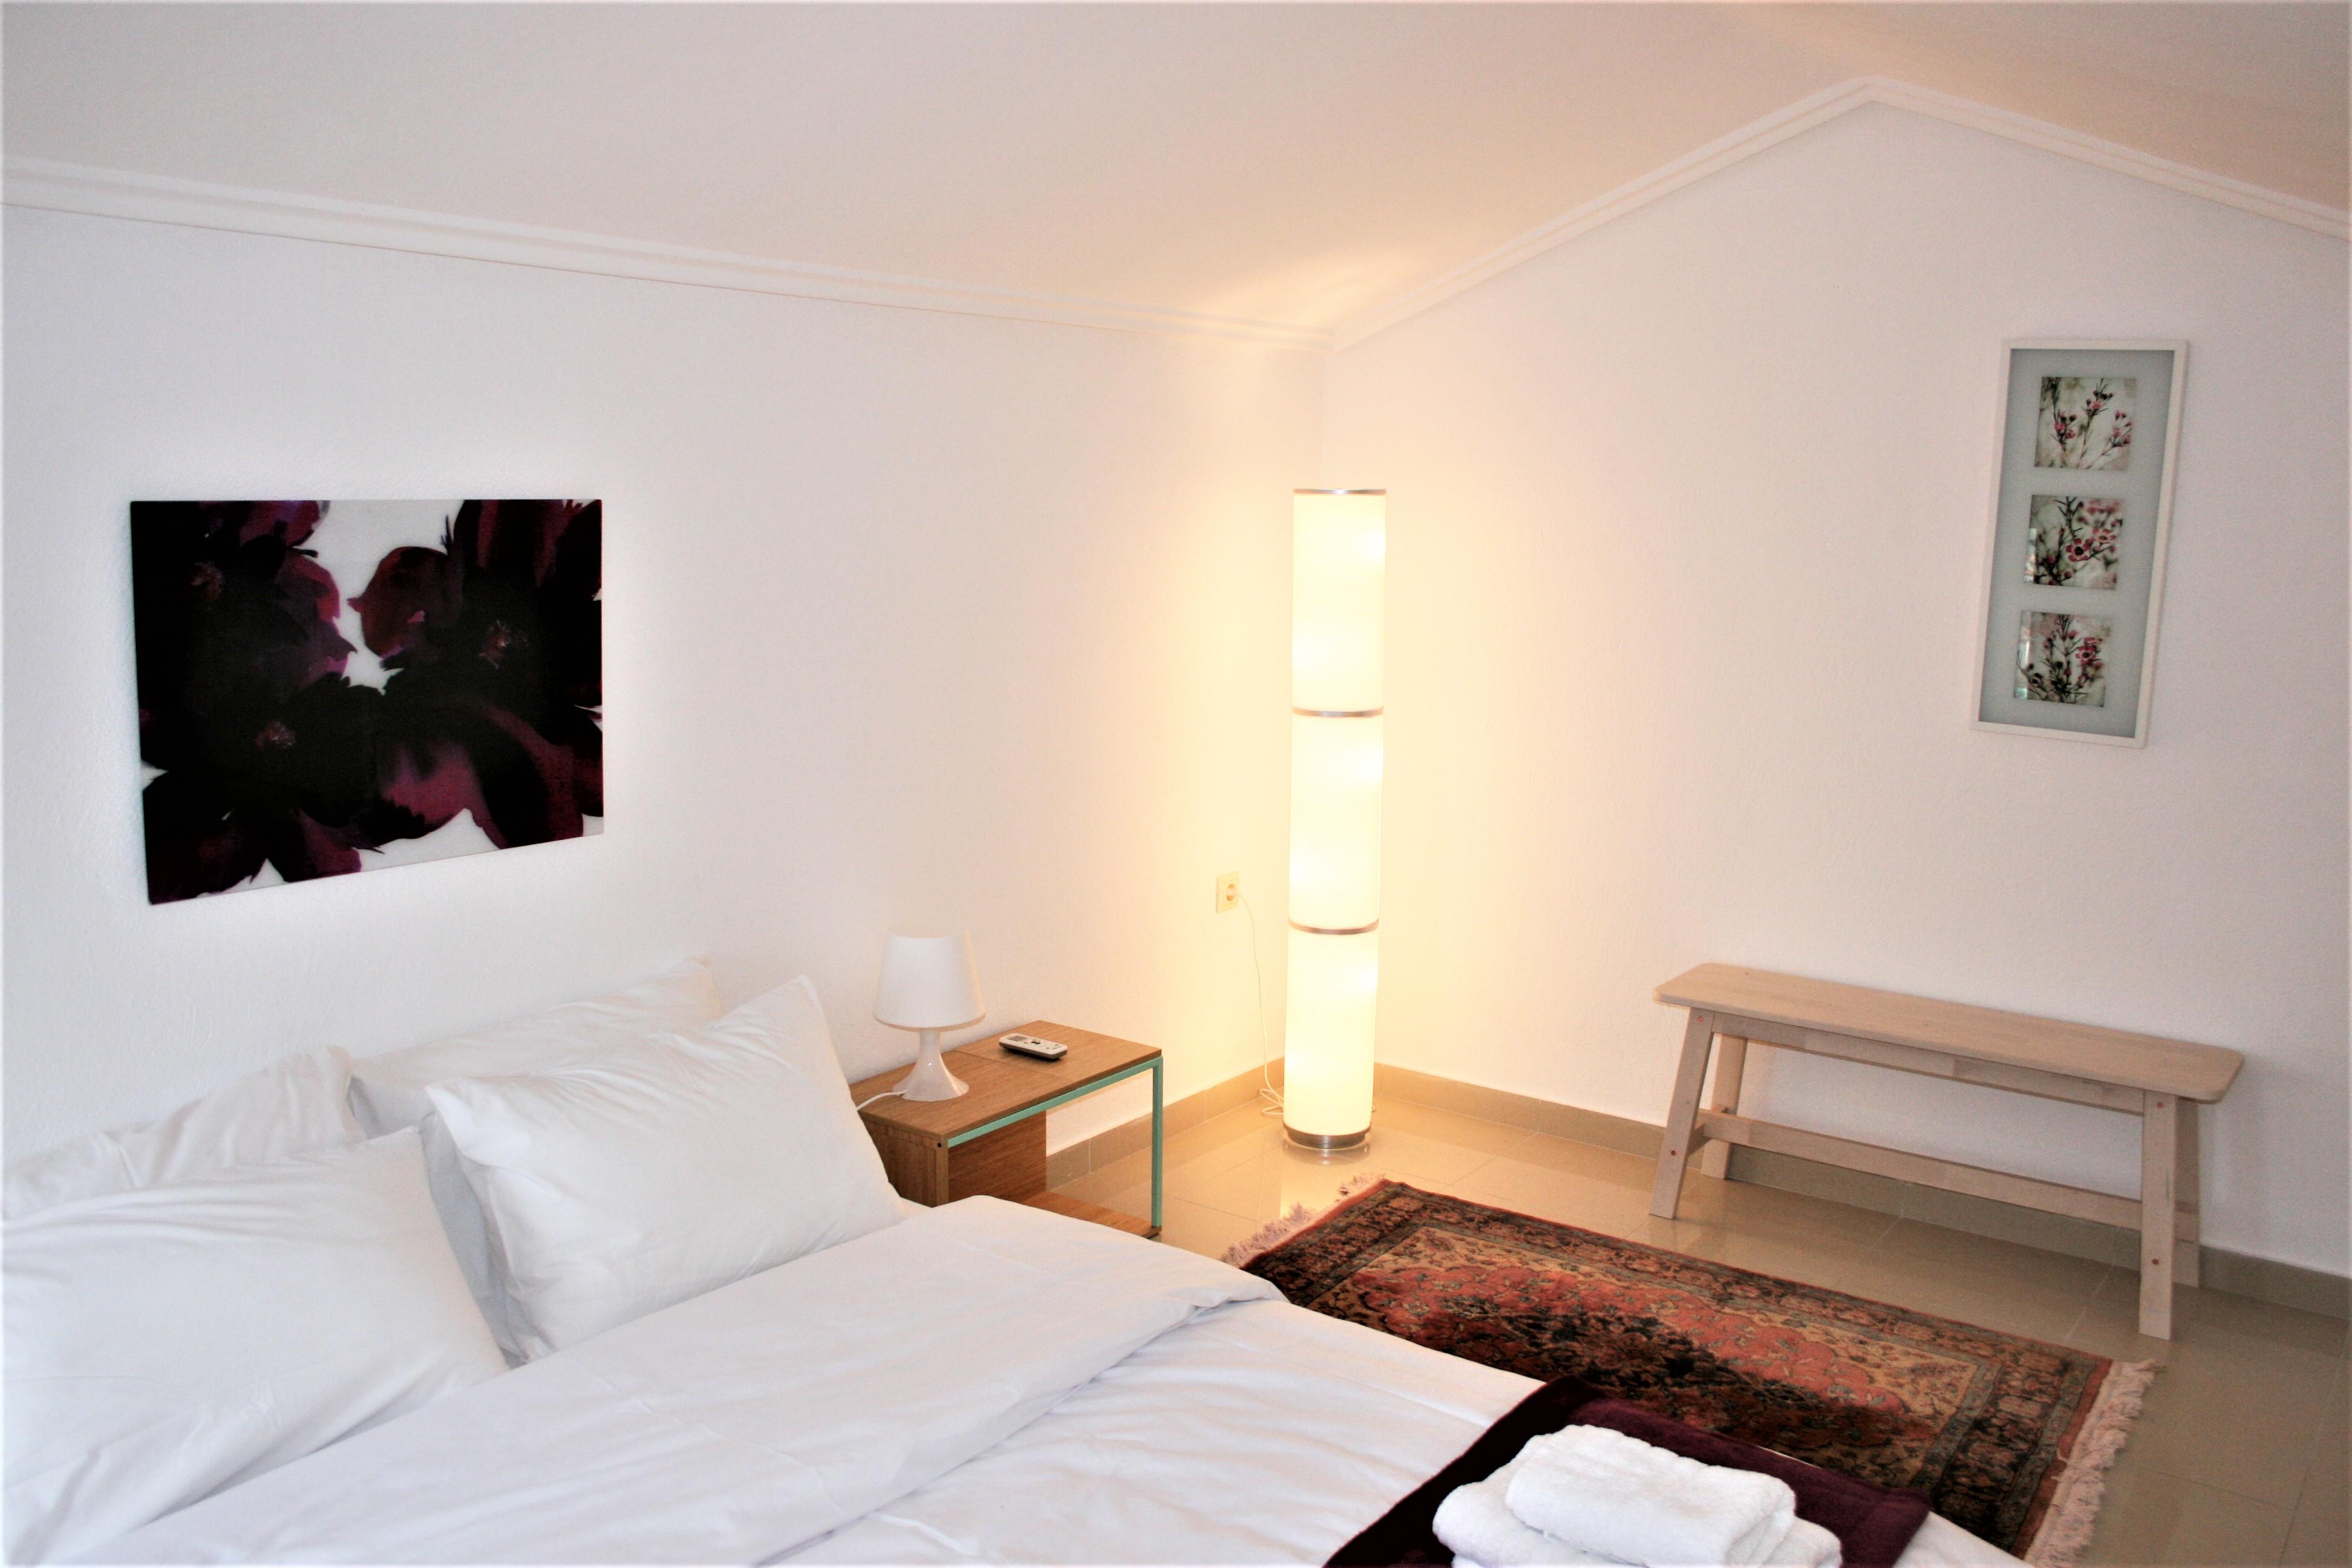 Bedroom 2 - loft